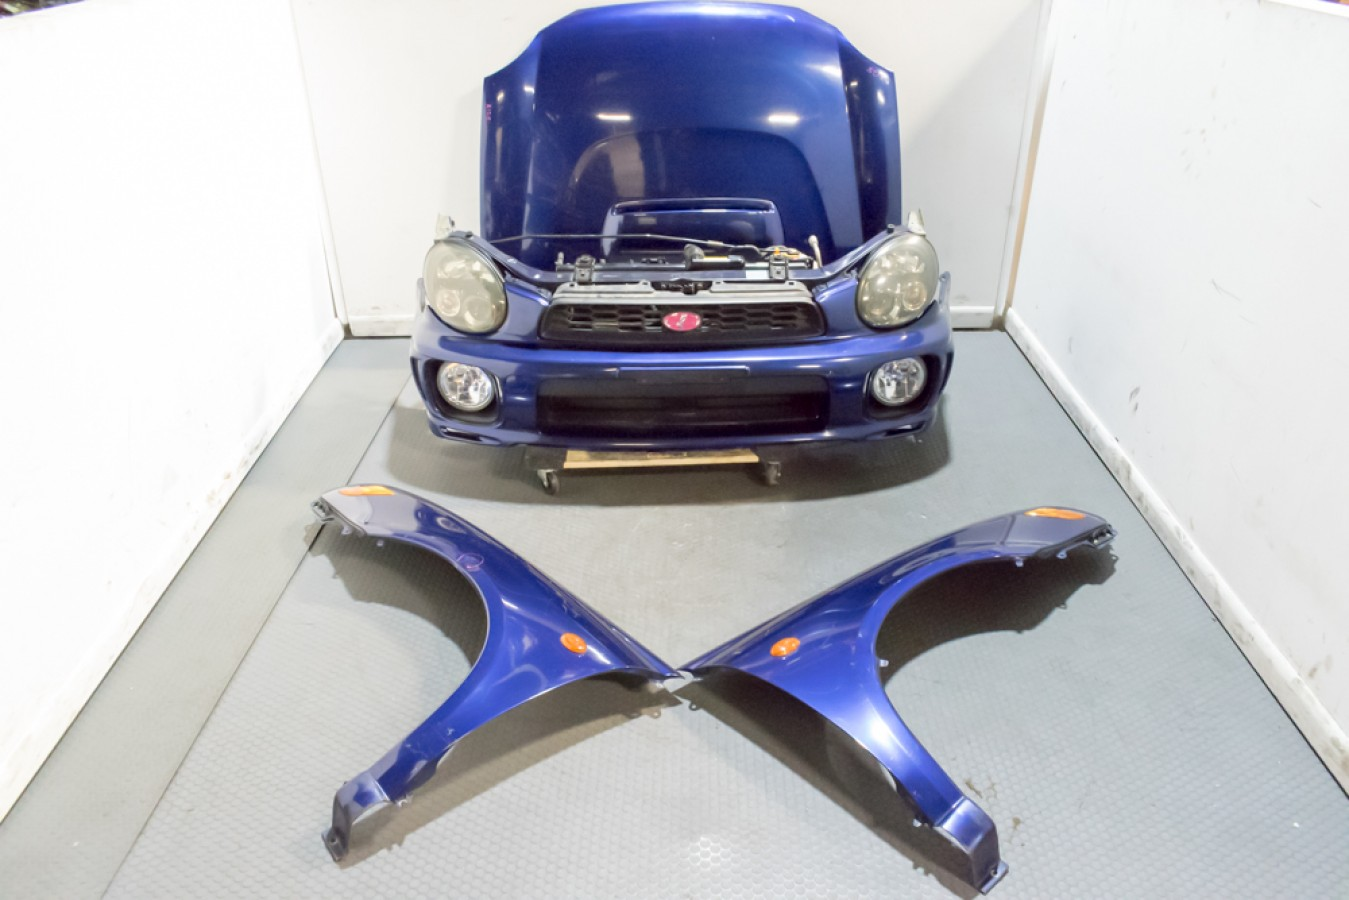 2002 2003 Subaru Impreza Wrx Wagon Front End Conversion With Hid Headlights Subaru J Spec Auto Sports